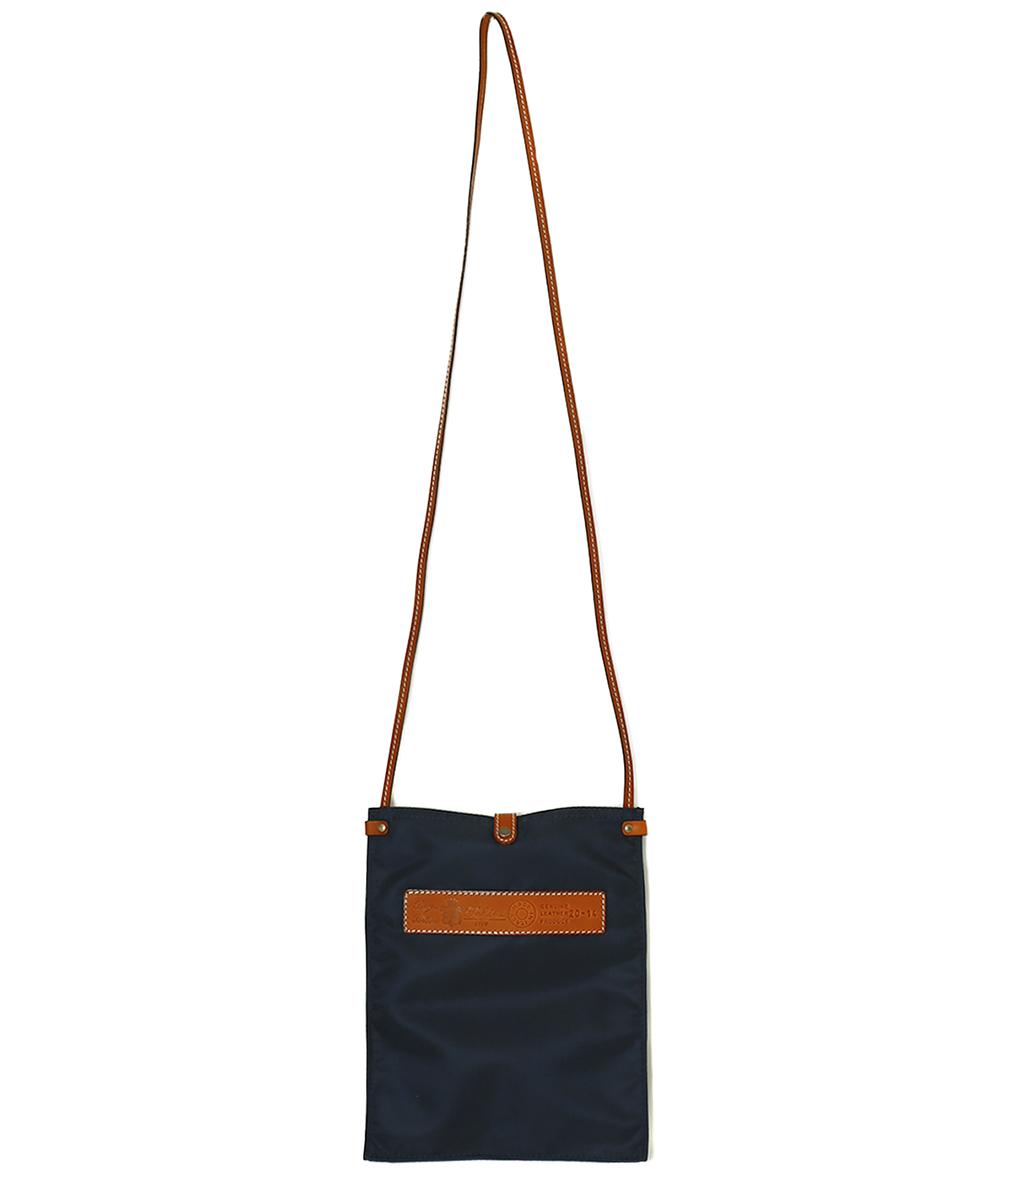 Felisi / フェリージ : Shoulder Bag : ショルダーバック メンズ : 20-14-DS-045-bjb 【BJB】